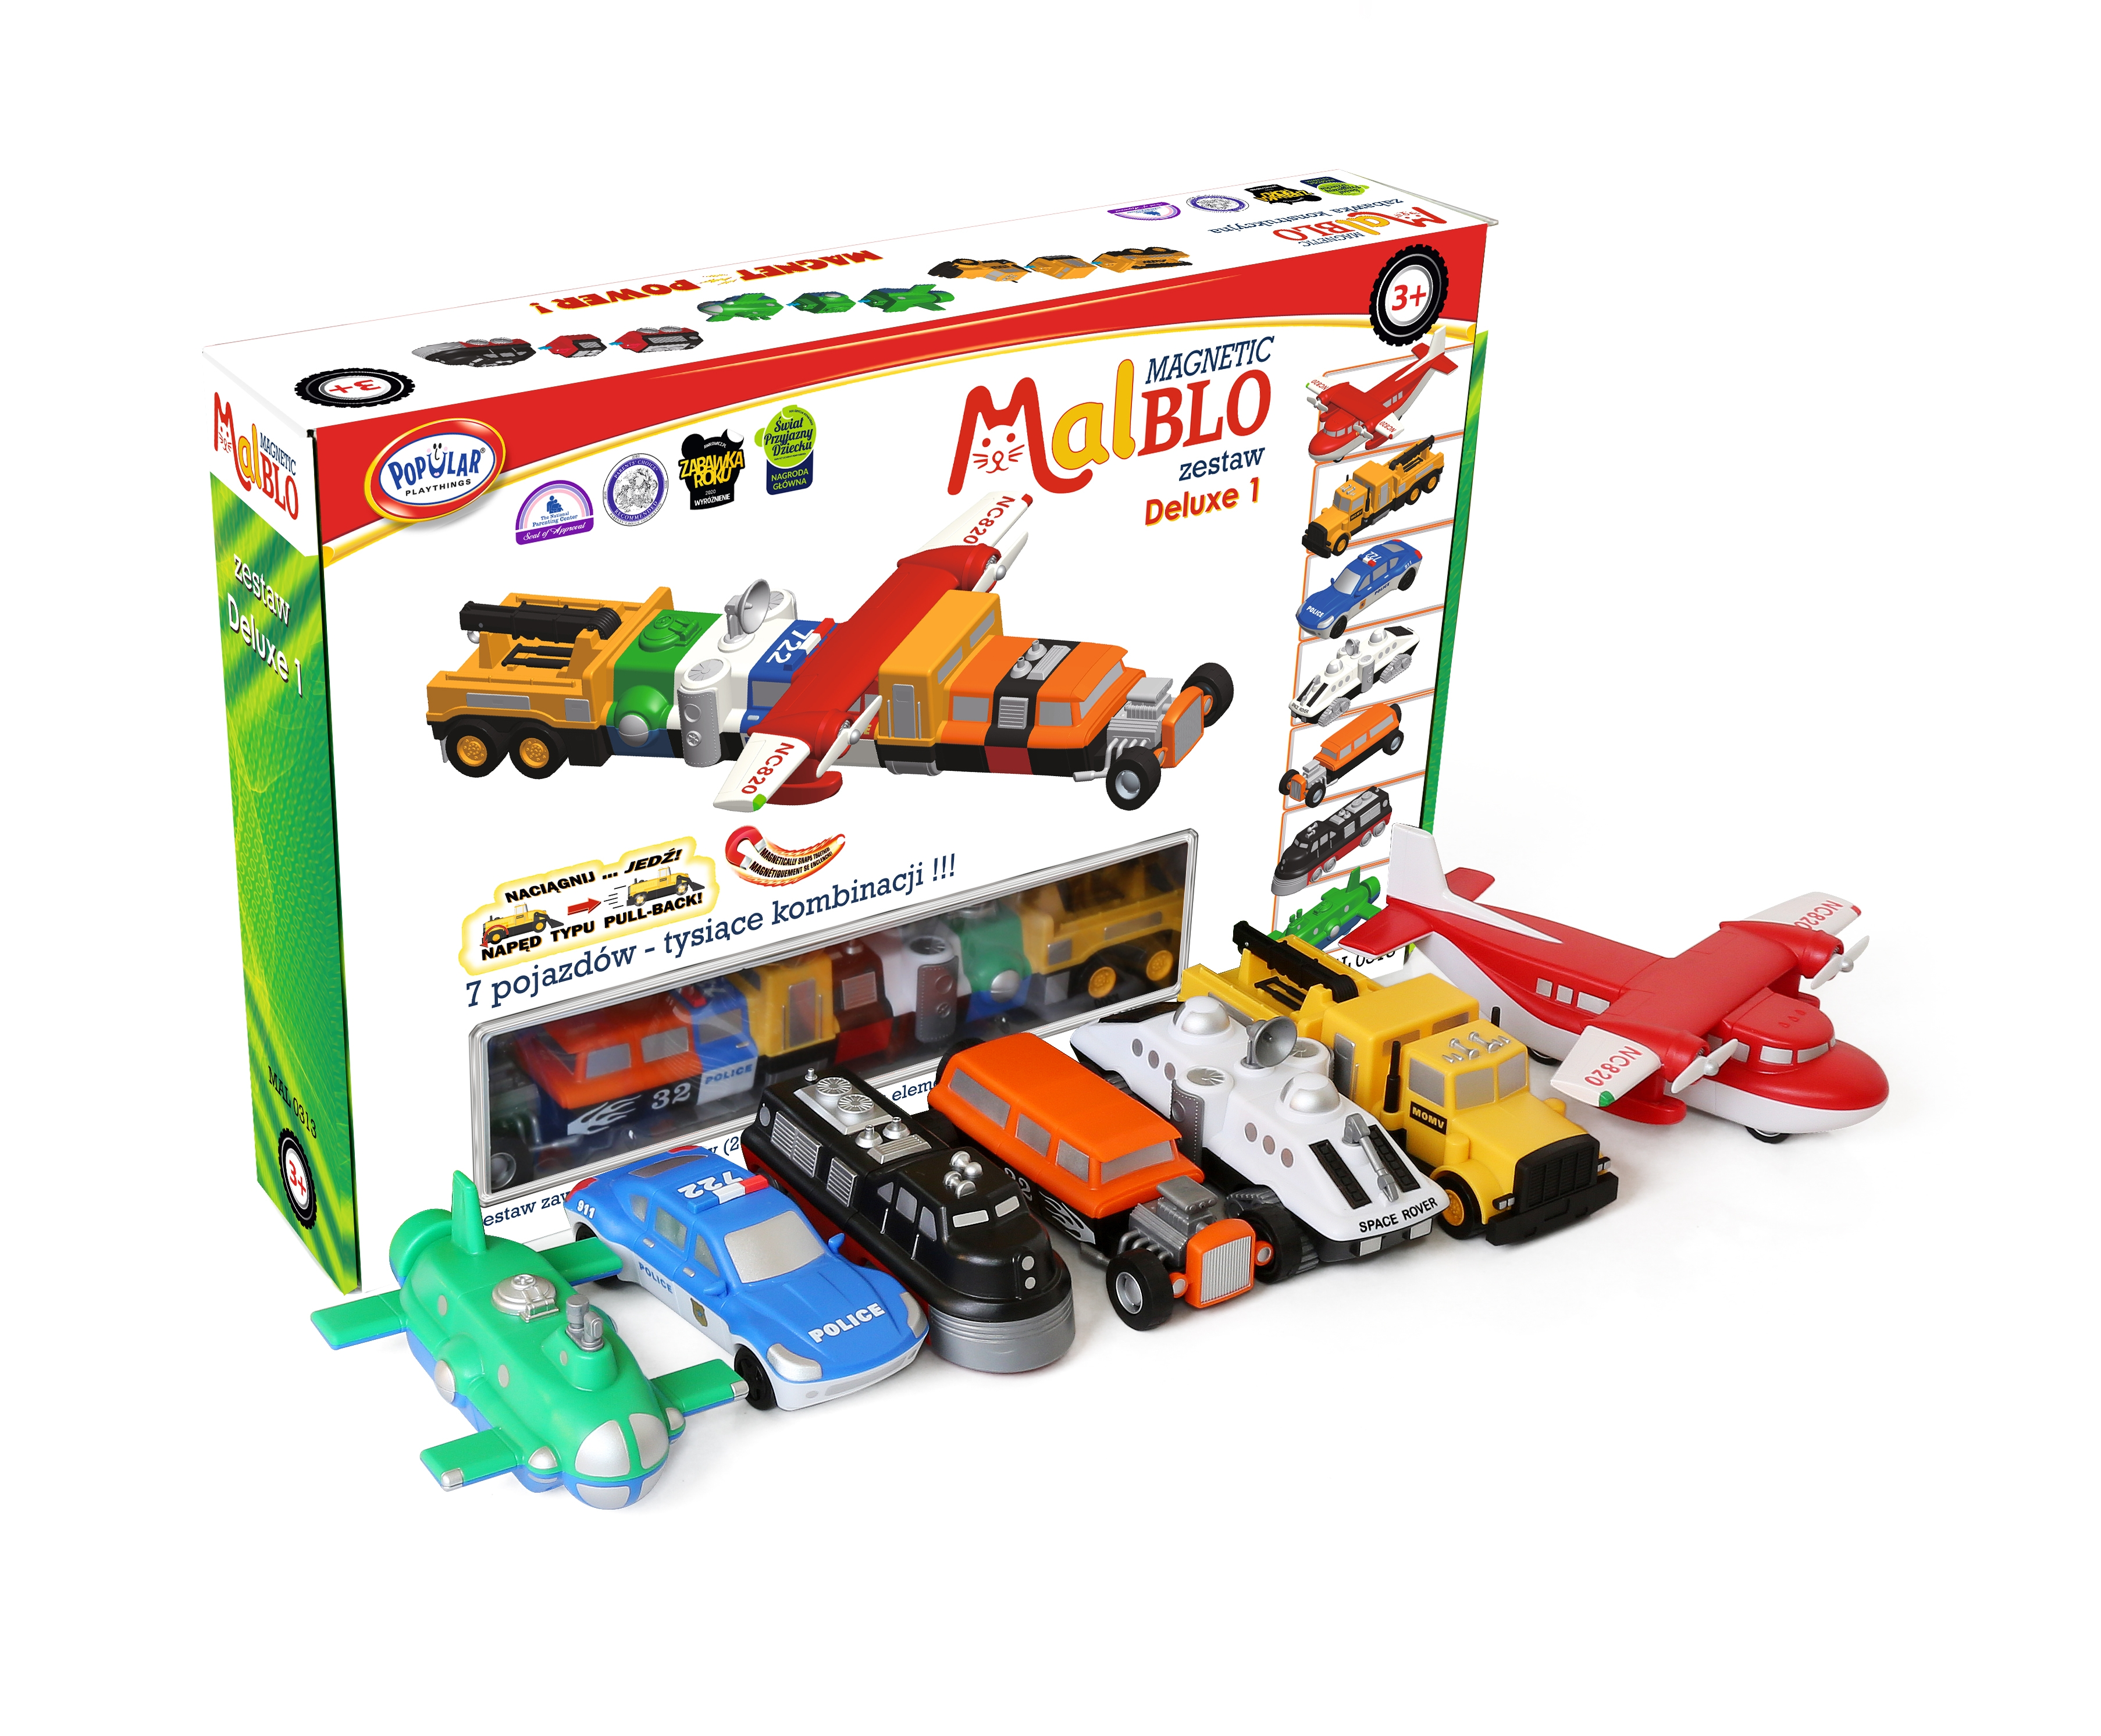 MalBlo, Magnetic Deluxe 1 (MAL 0313)